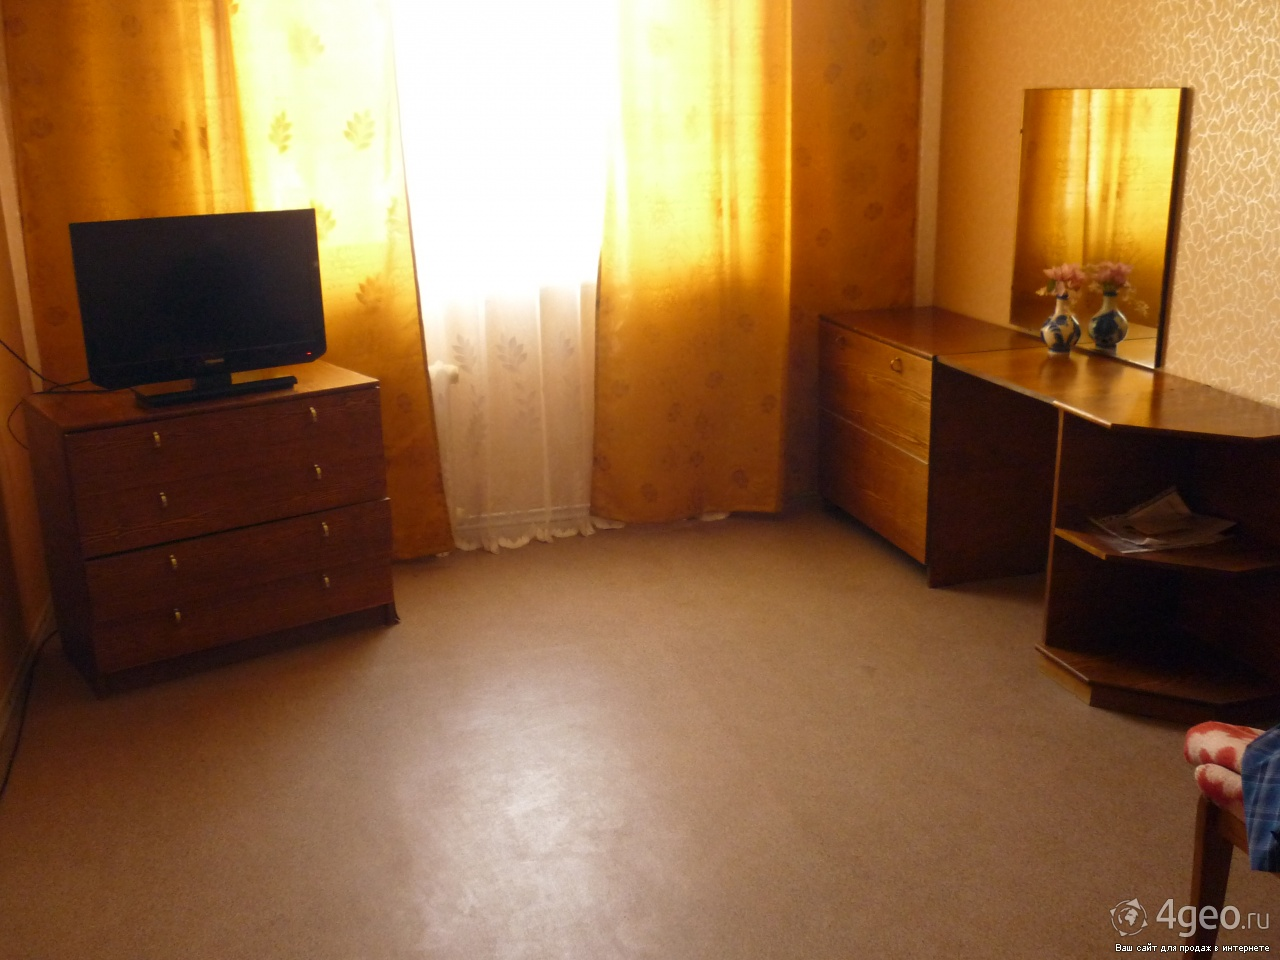 Гостиница Уют Байкальск  otelsru